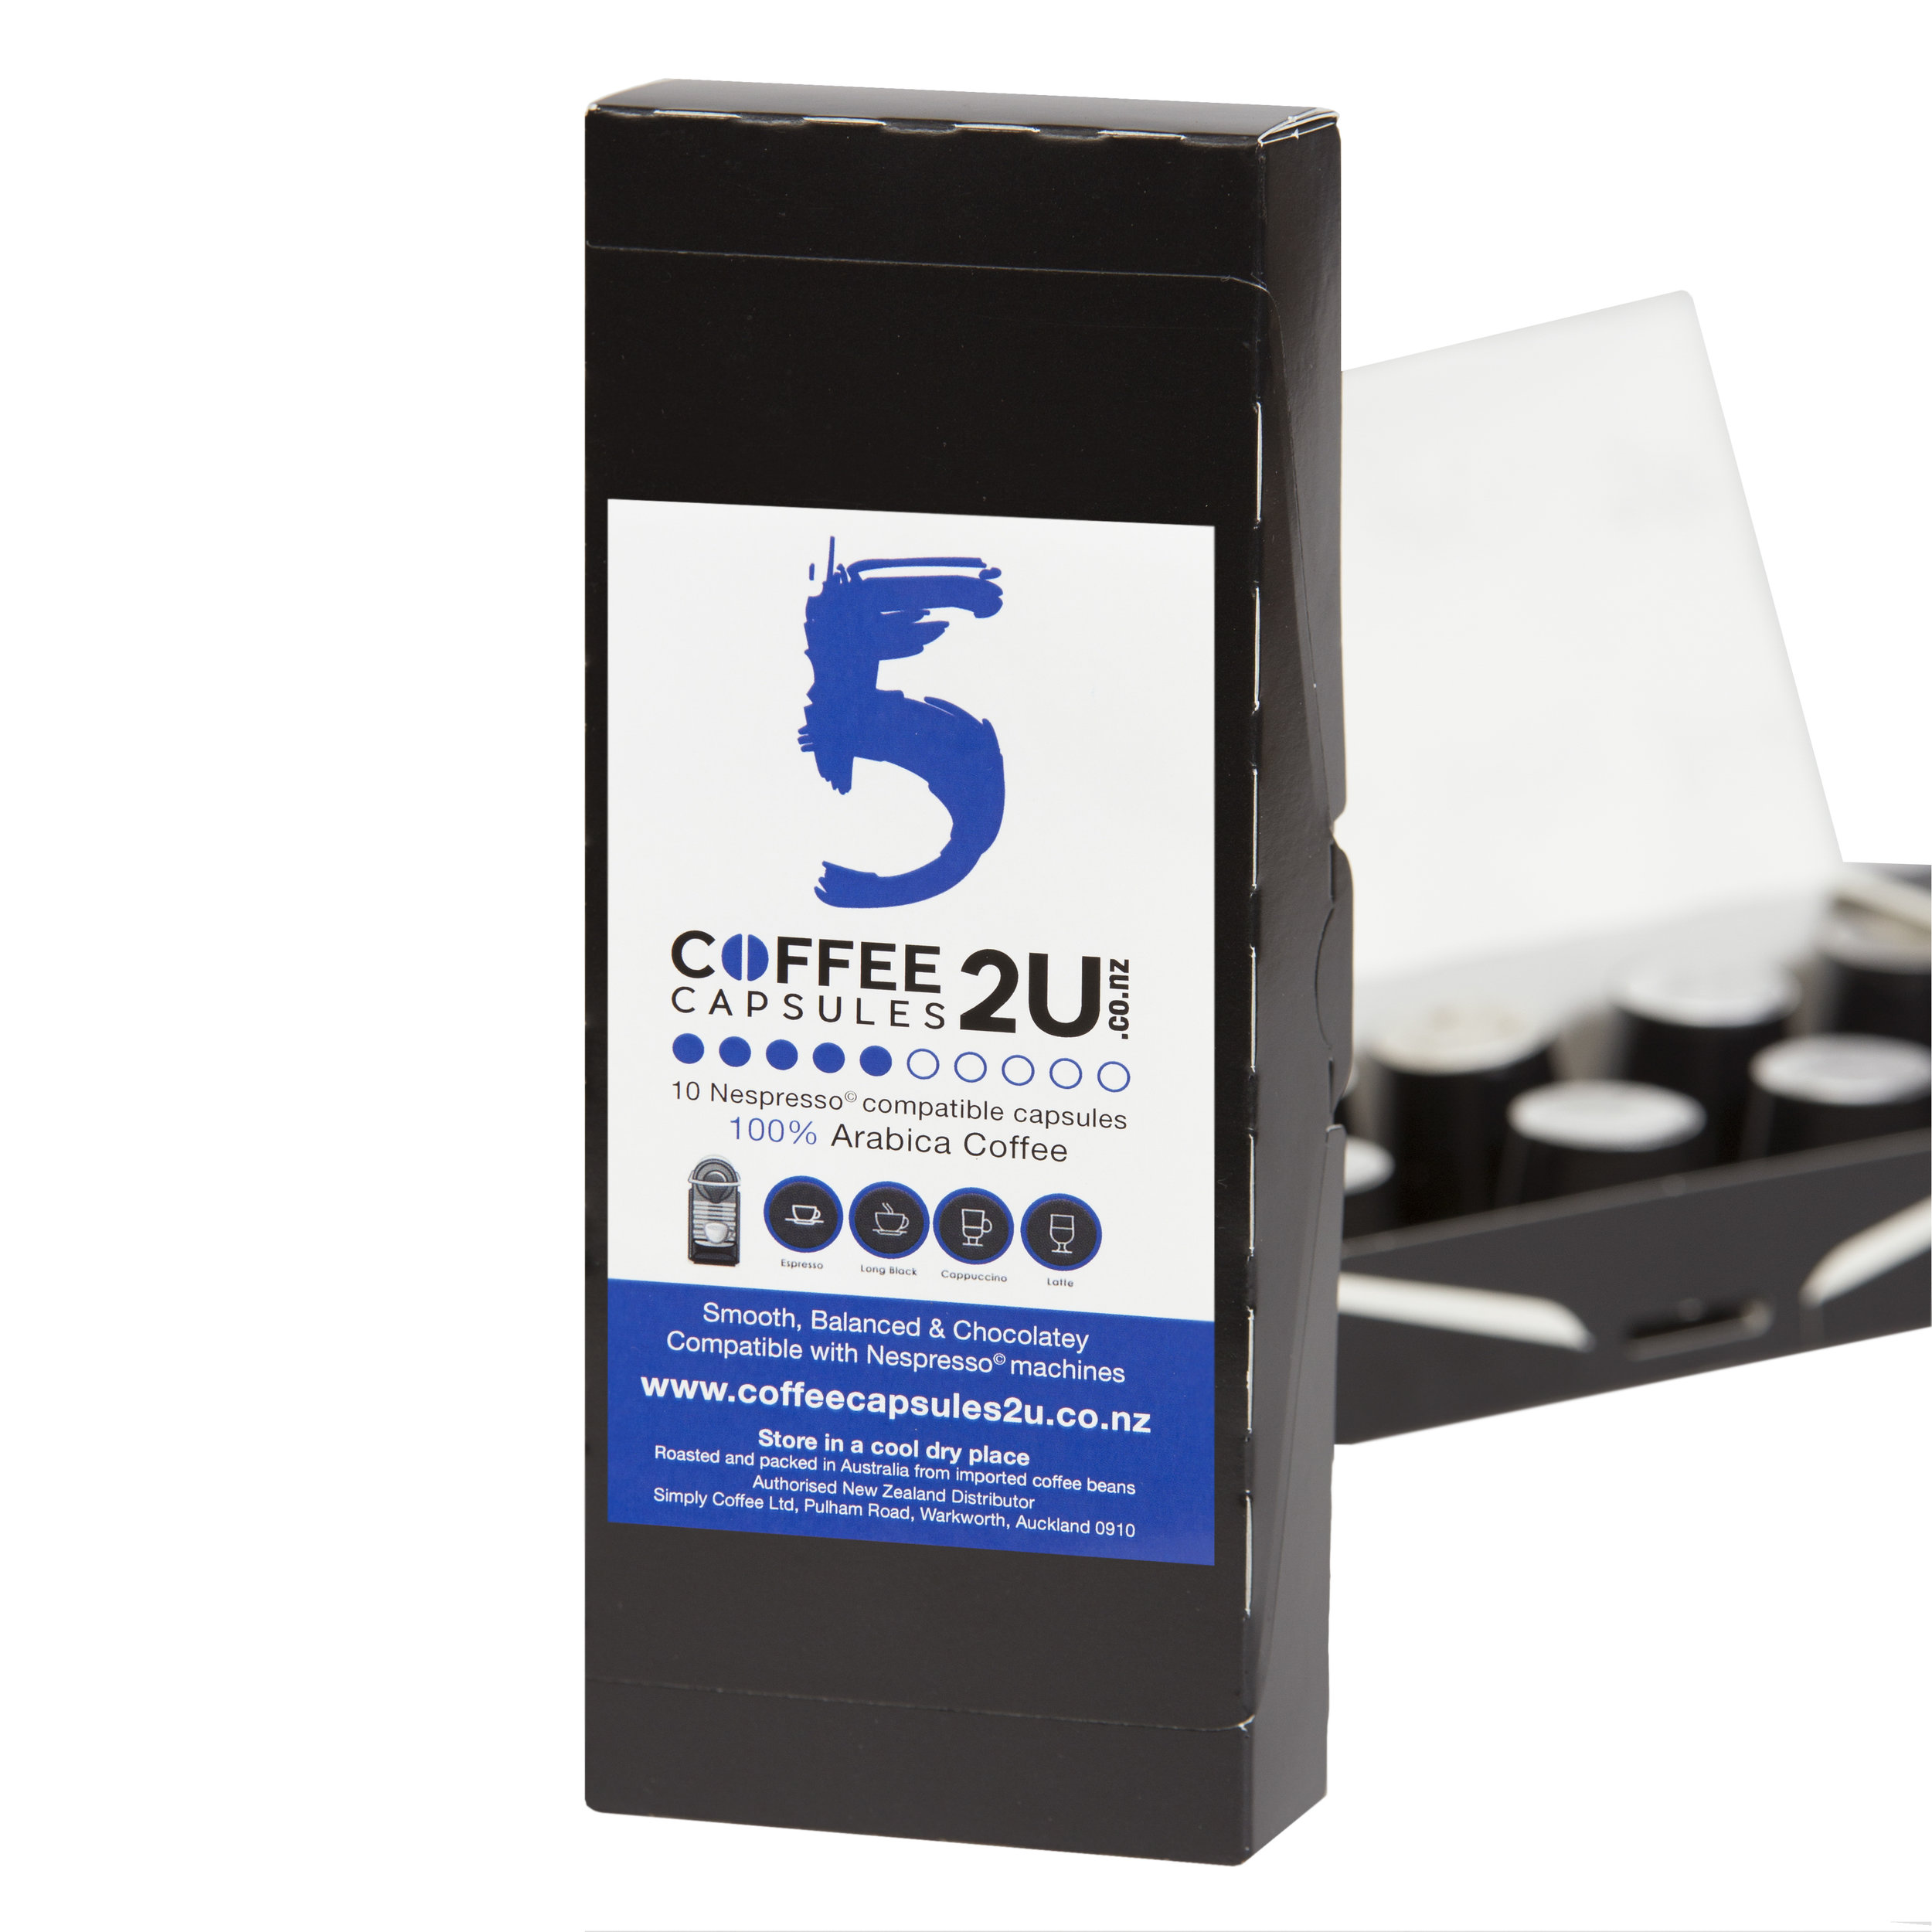 Coffee 2 U 5.jpg